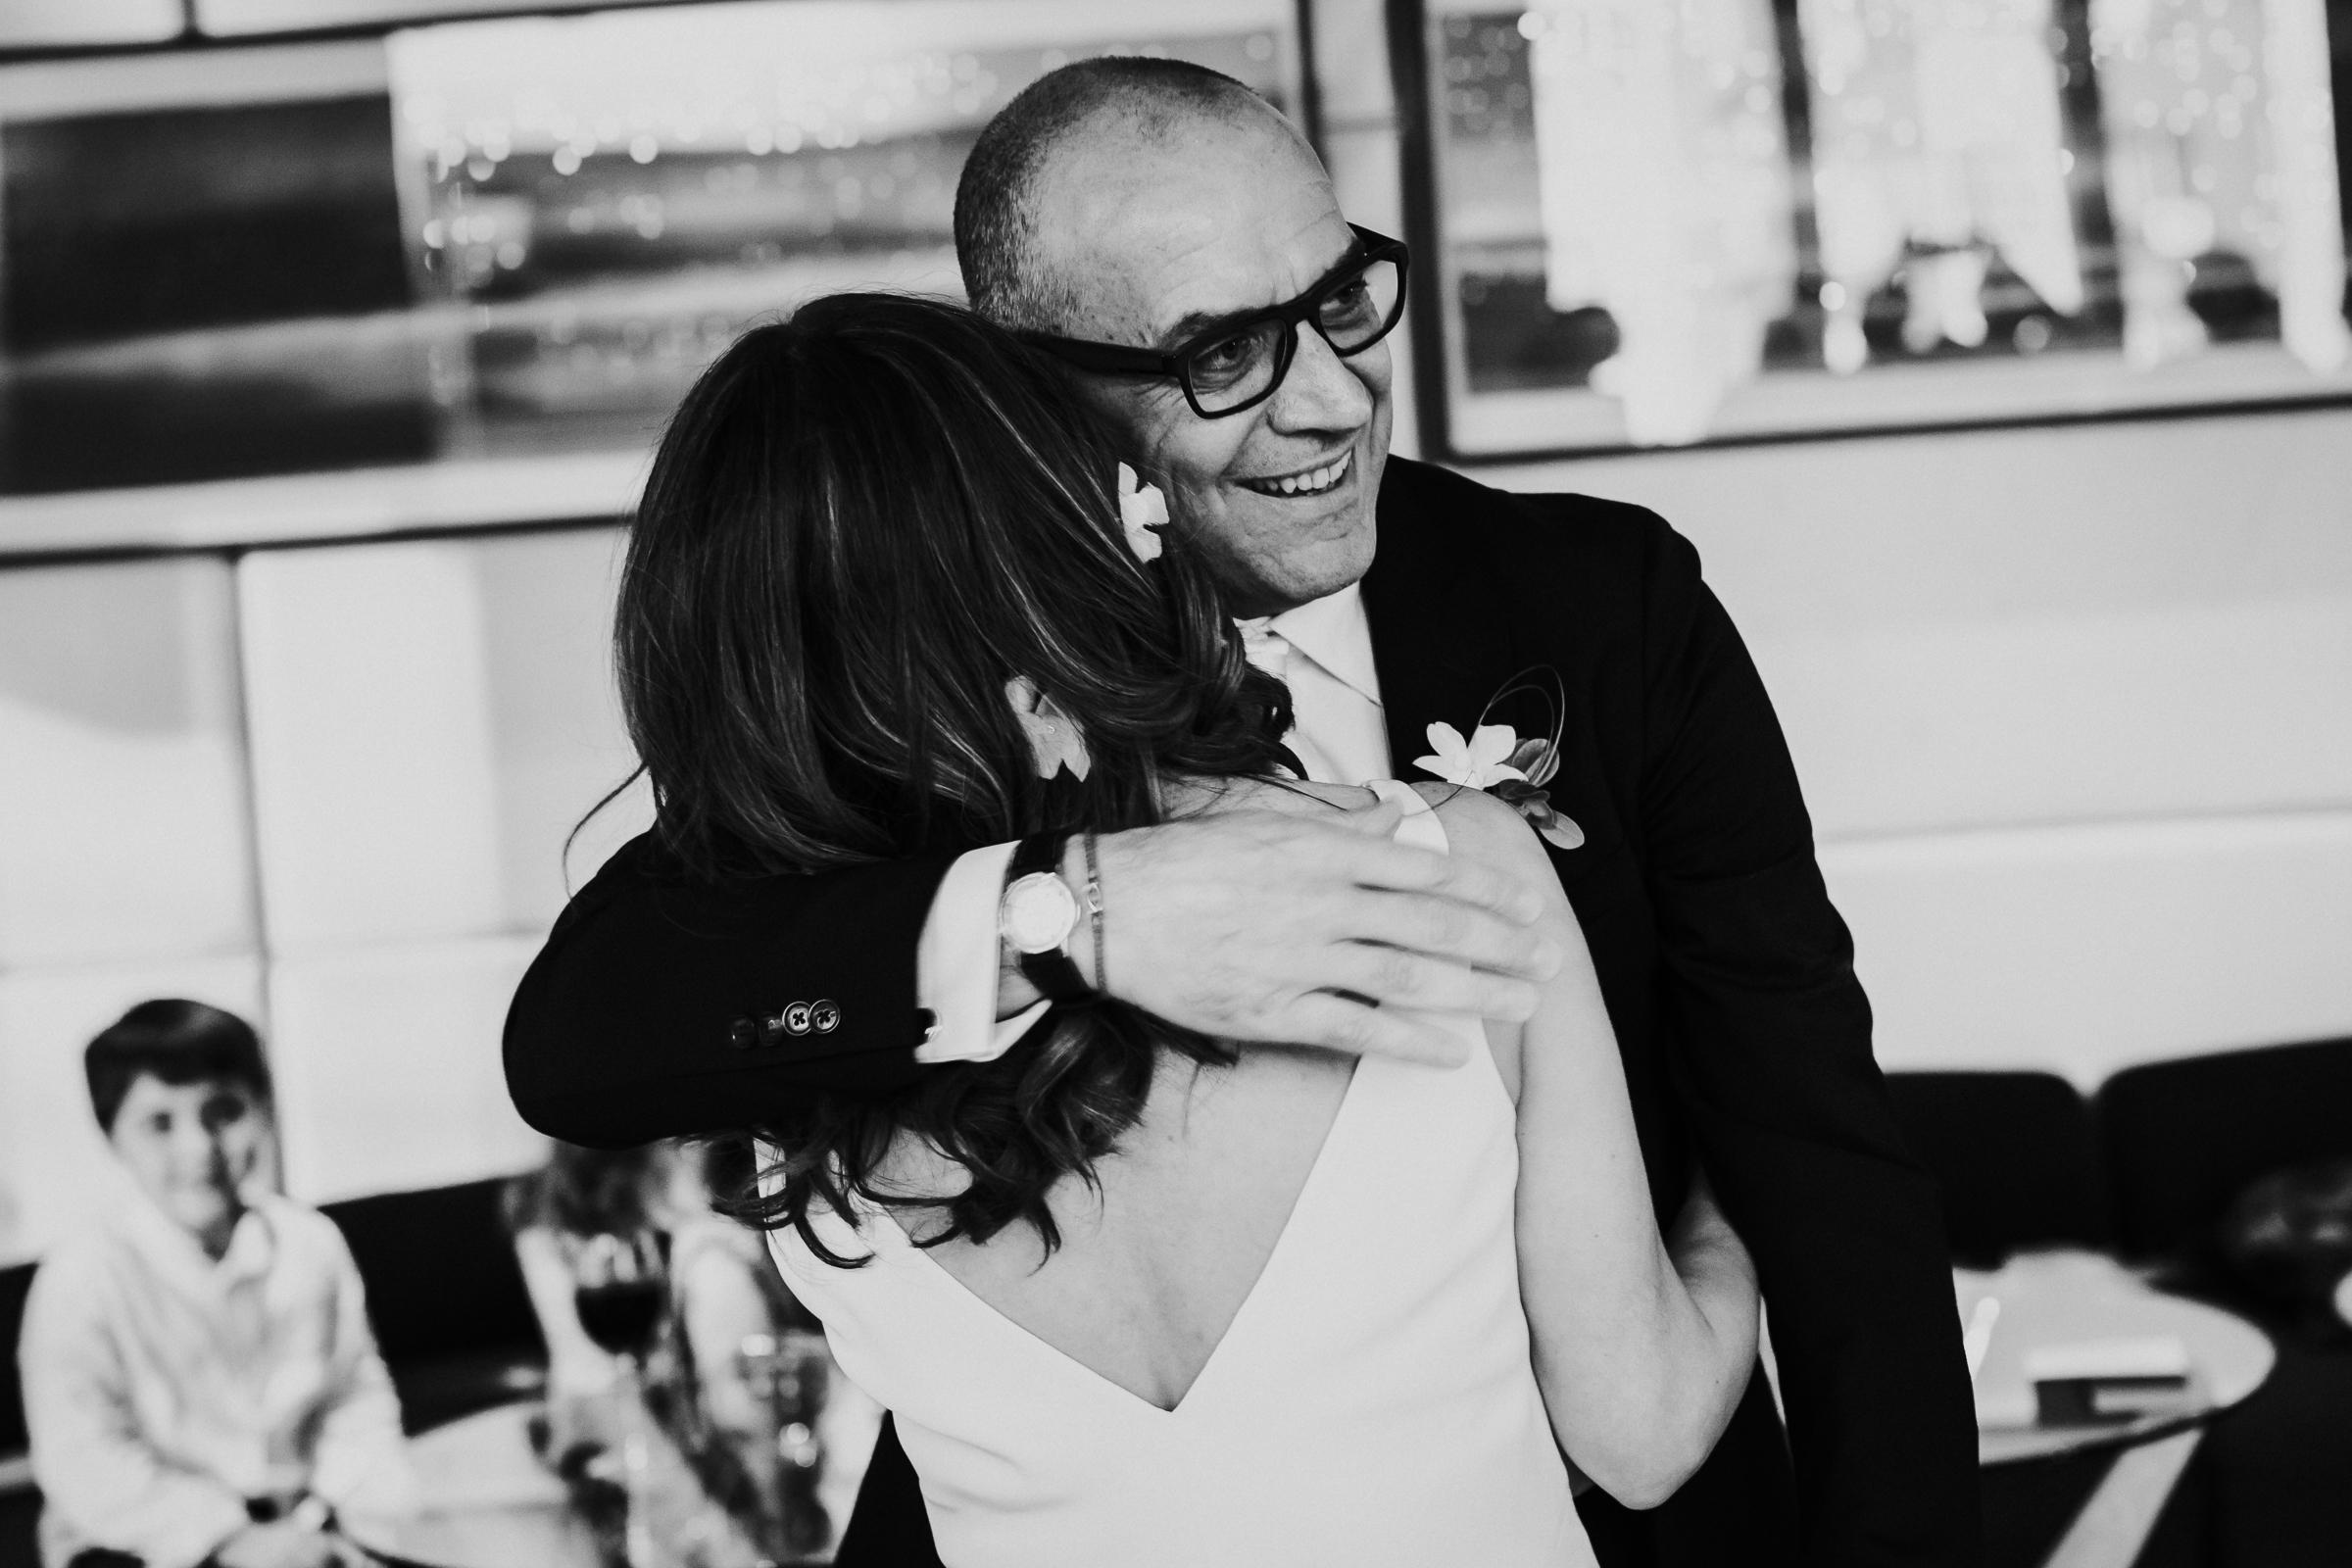 Robert-NYC-Museum-Of-Arts-&-Design-Greek-Italian-New-York-Documentary-Wedding-Photographer-65.jpg